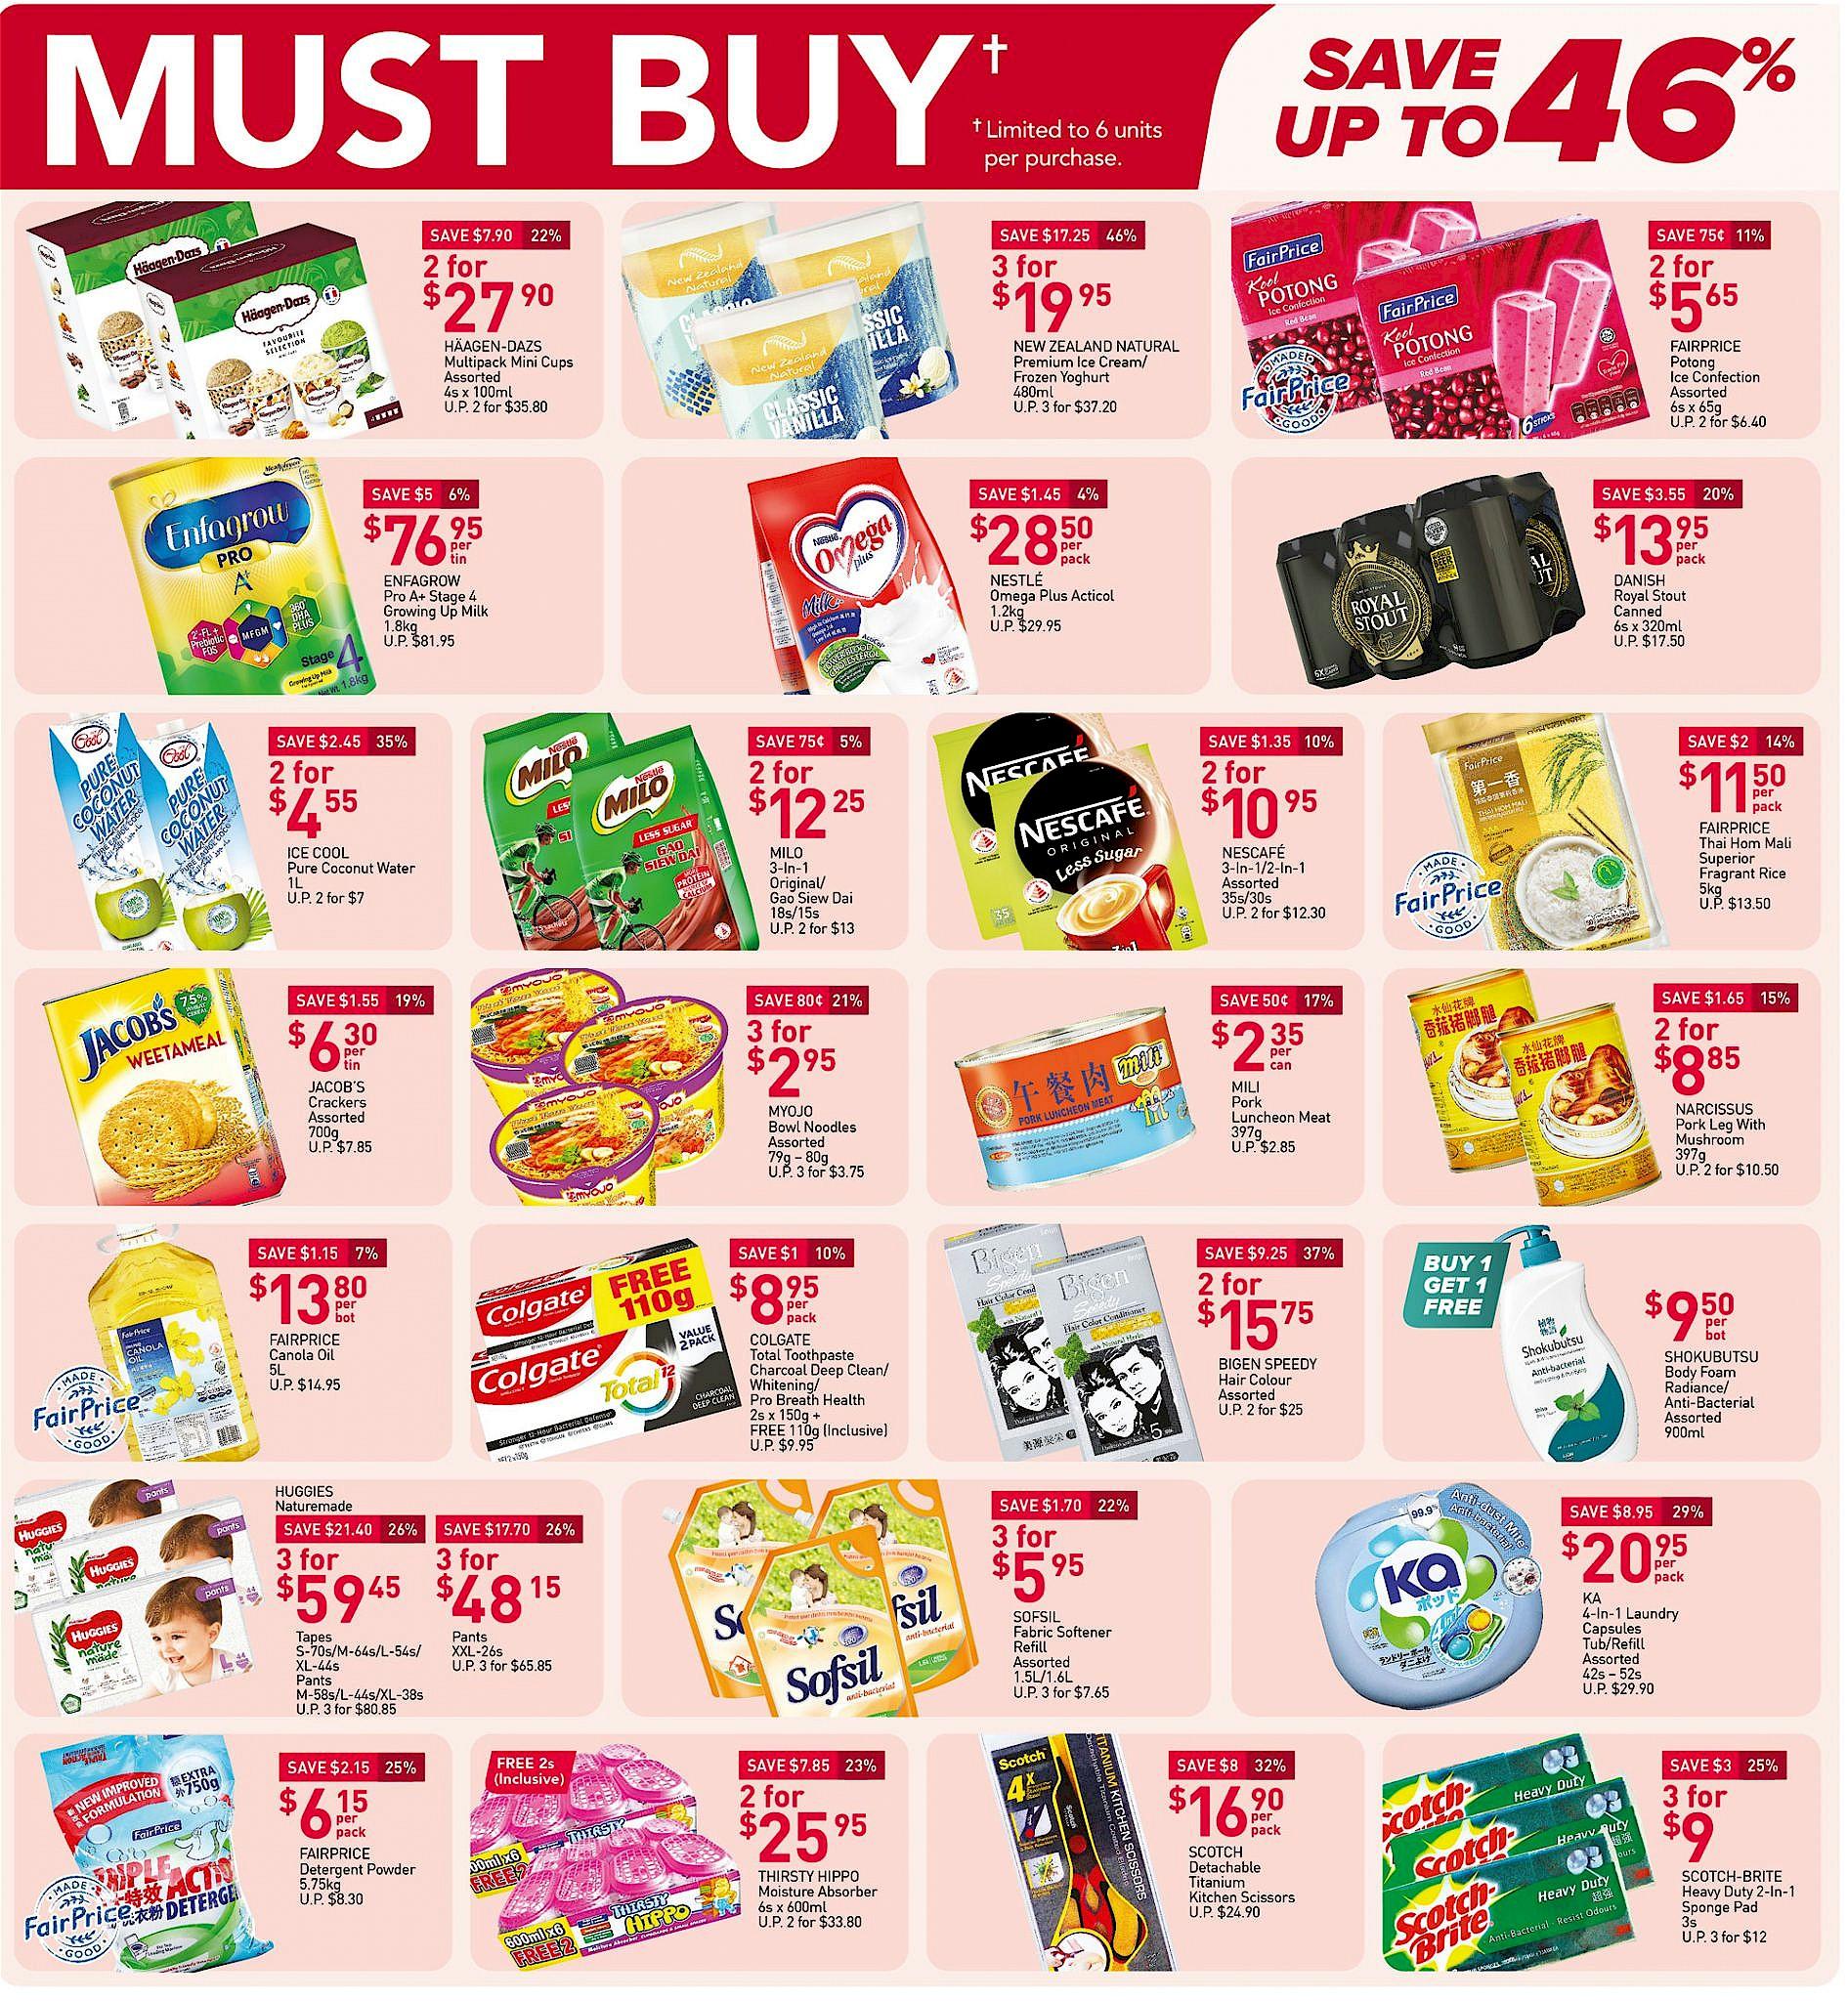 Fair-Price-Must-Buy-9-Sep-1